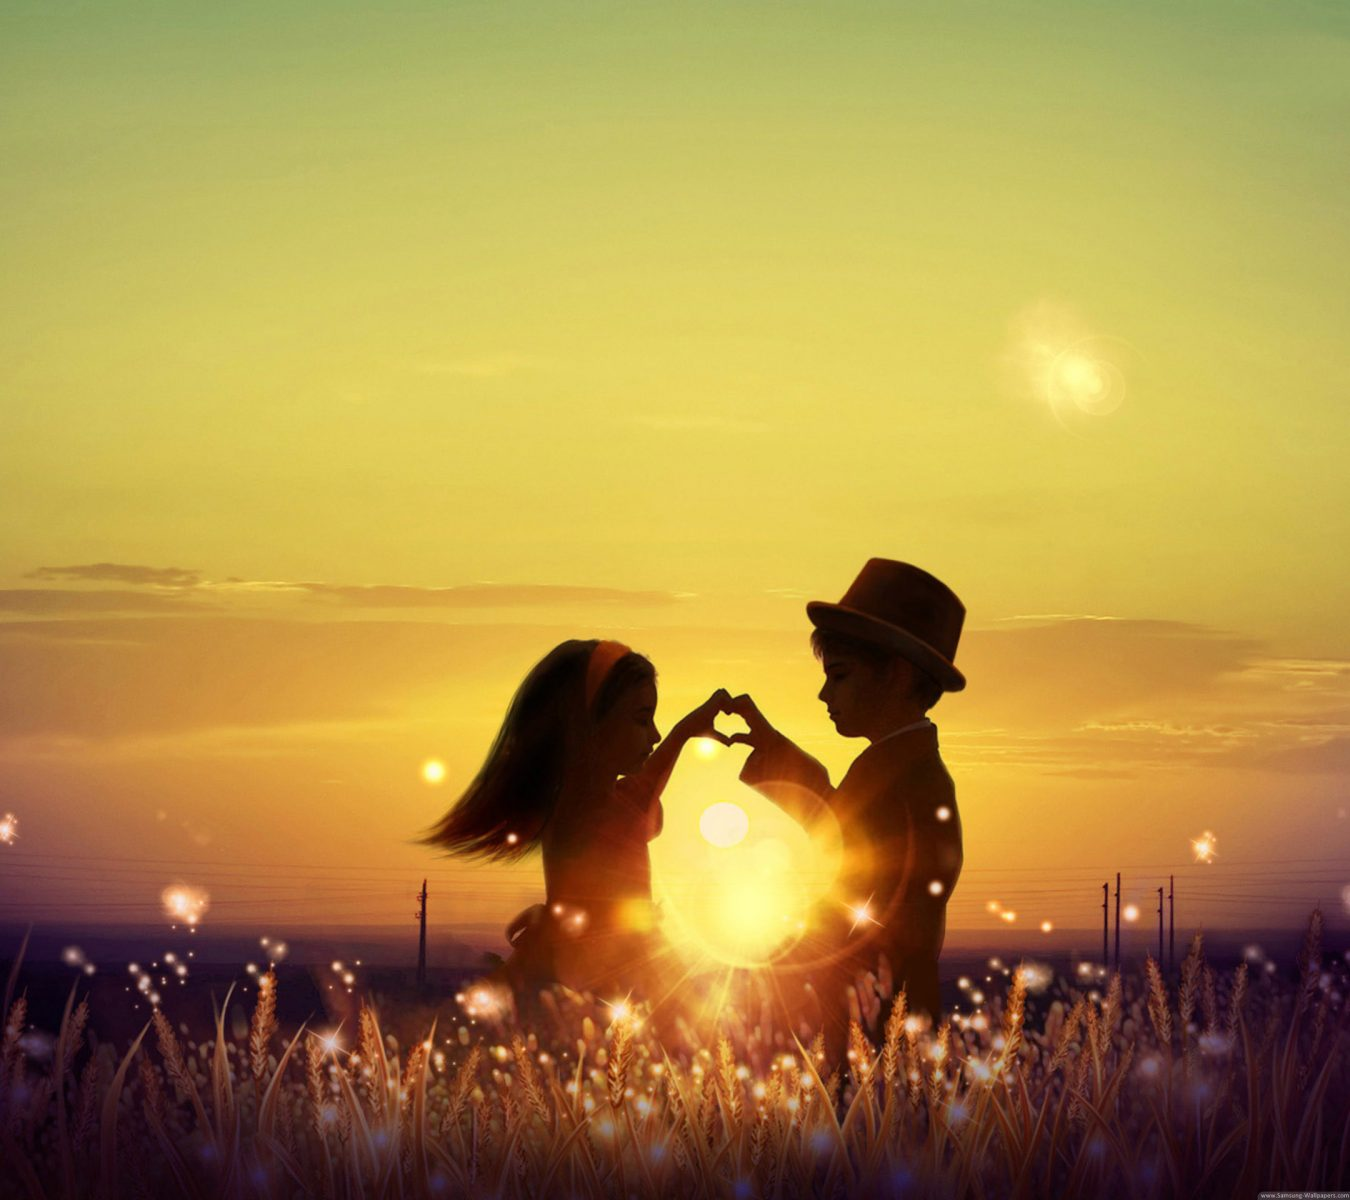 Bambini e amore